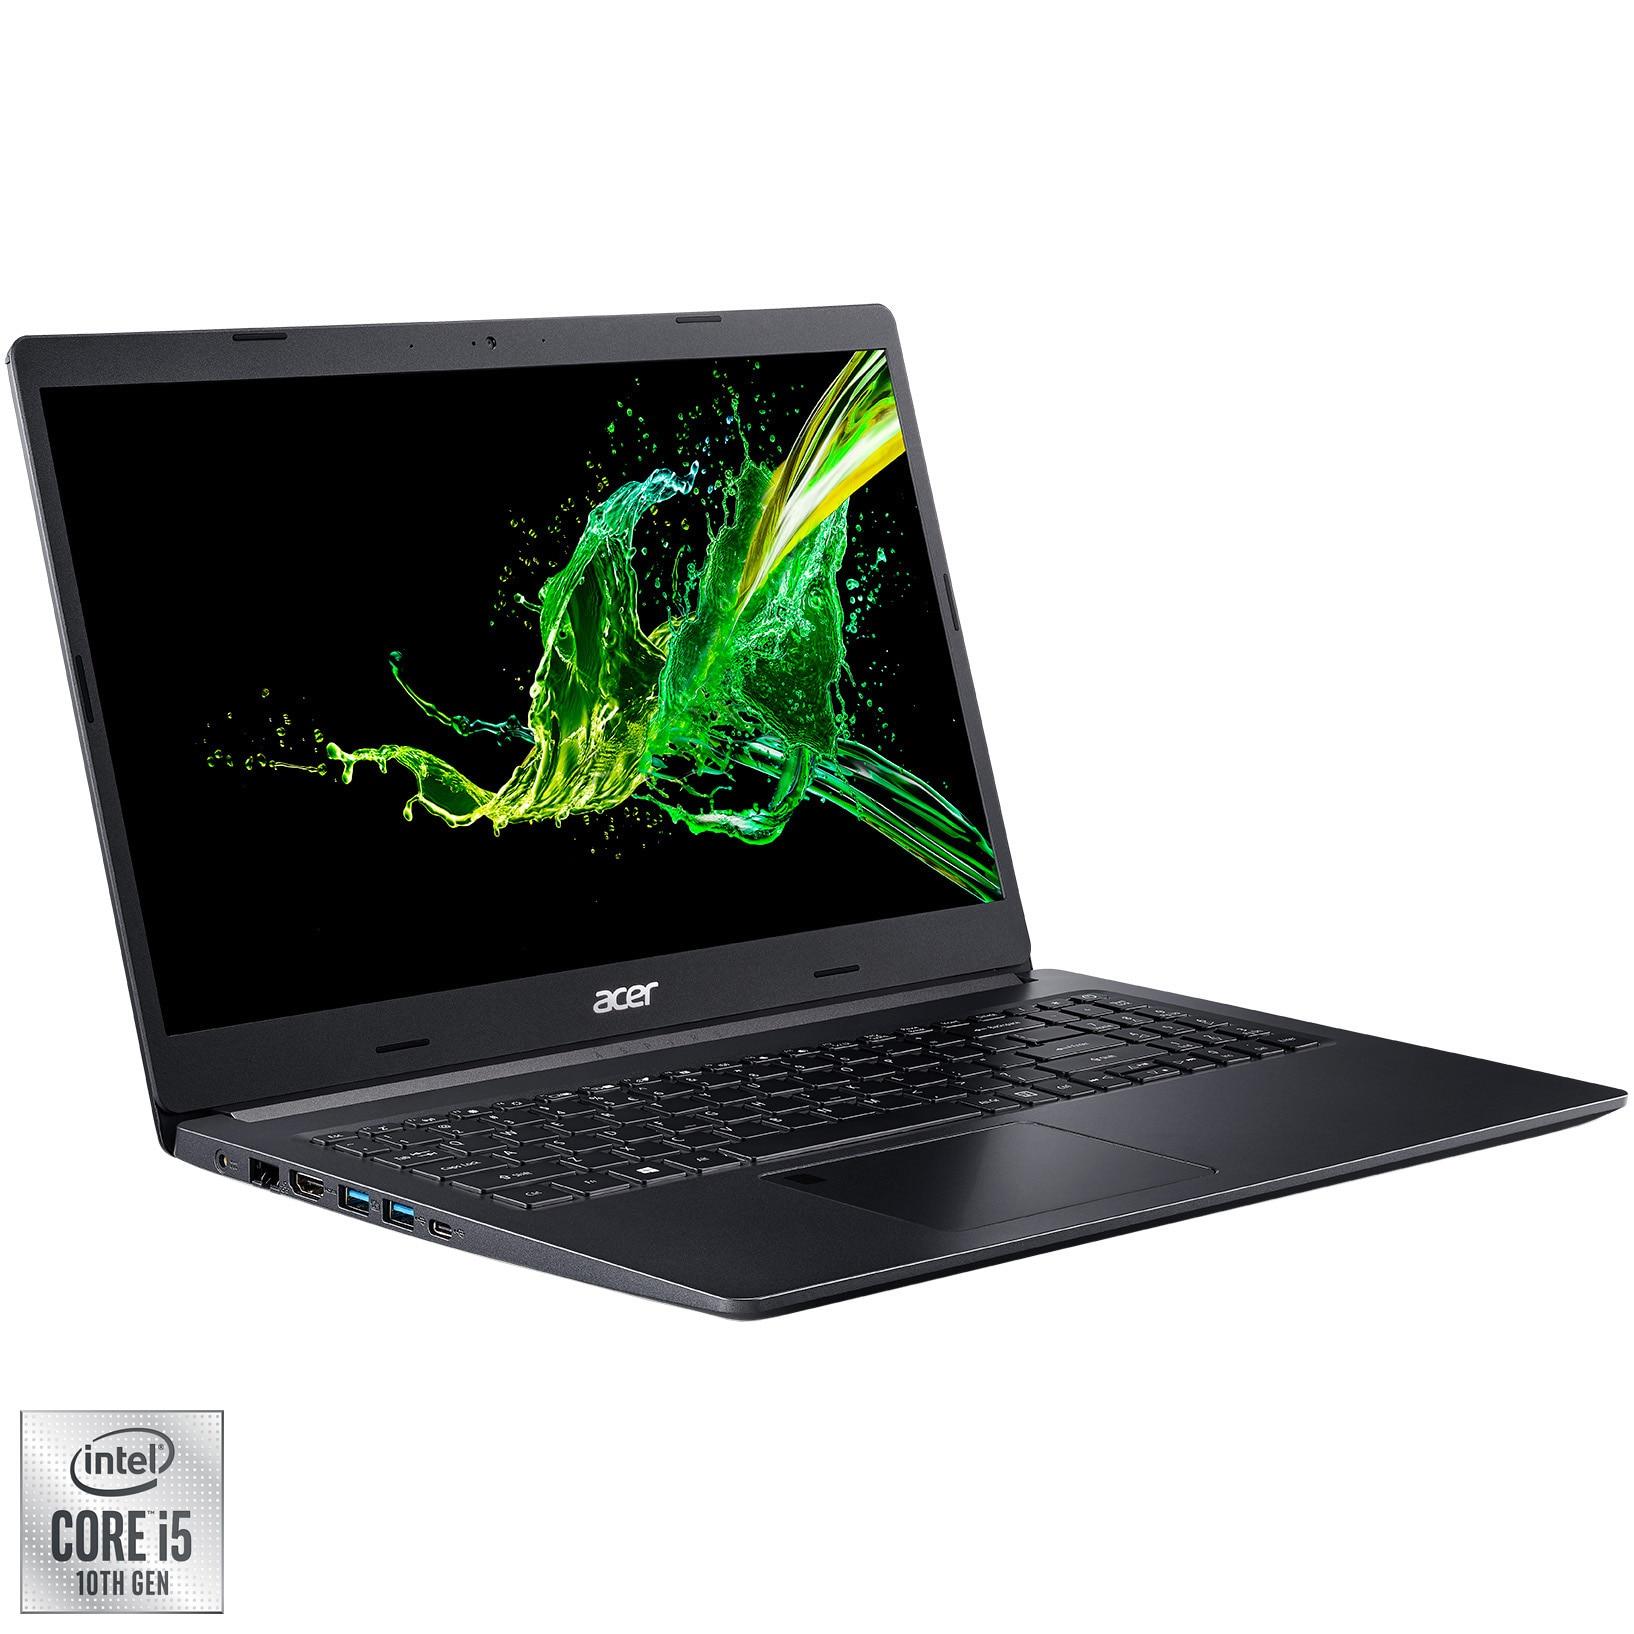 "Fotografie Laptop Acer Aspire 5 A515-55 cu procesor Intel® Core™ i5-1035G1 pana la 3.60 GHz, 15.6"", Full HD, 8GB, 512GB SSD, Intel UHD Graphics, No OS, Black"